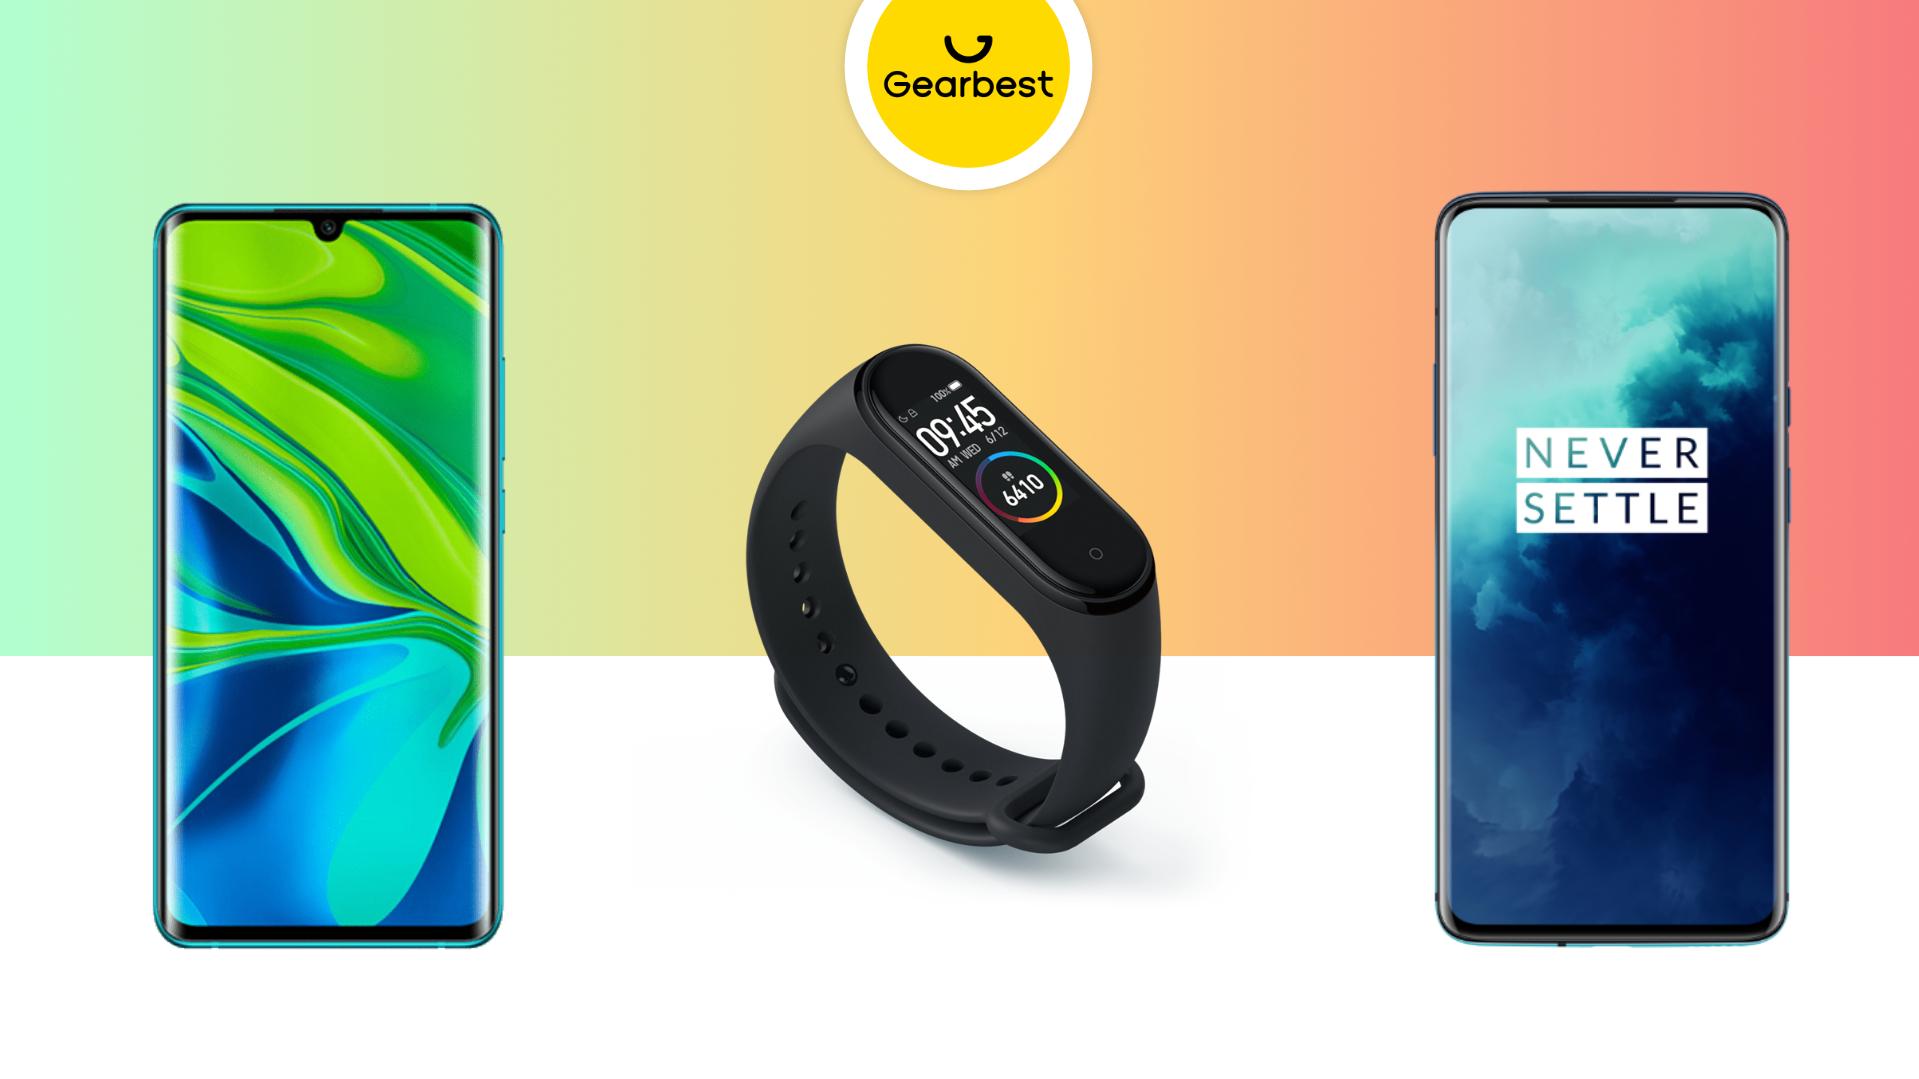 Xiaomi Mi Note 10 à 411 euros, Mi Band 4 à 23 euros et OnePlus 7T Pro à 606 euros